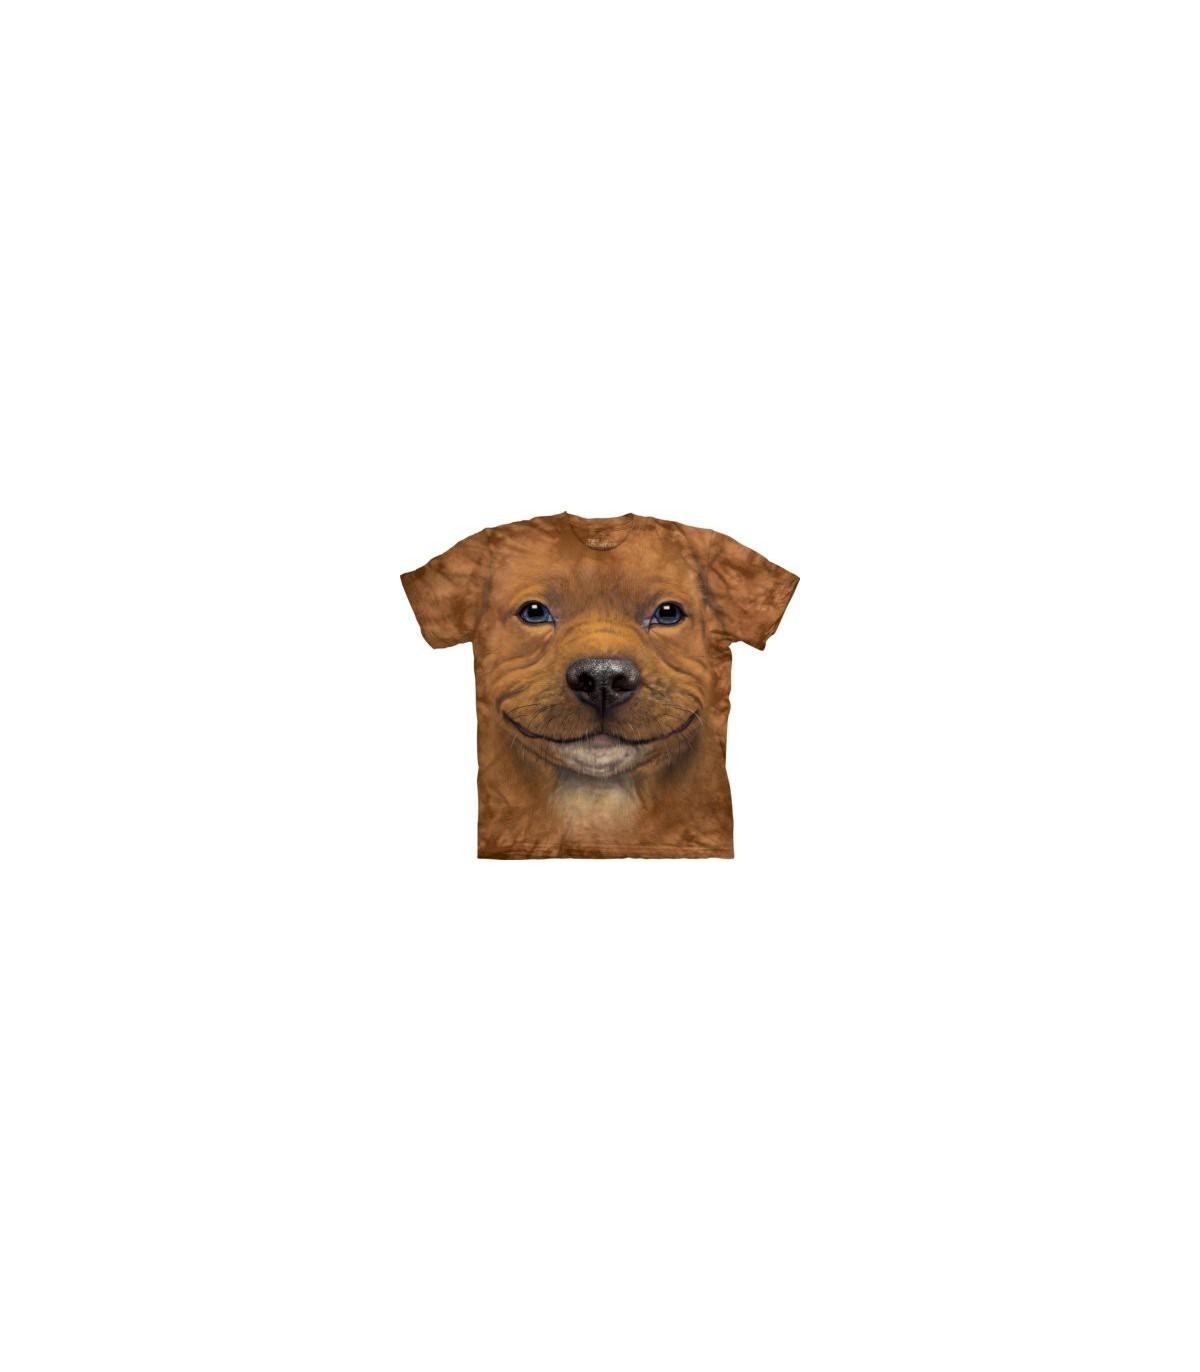 The Mountain Unisex Big Face Pitbull Puppy Dog T Shirt